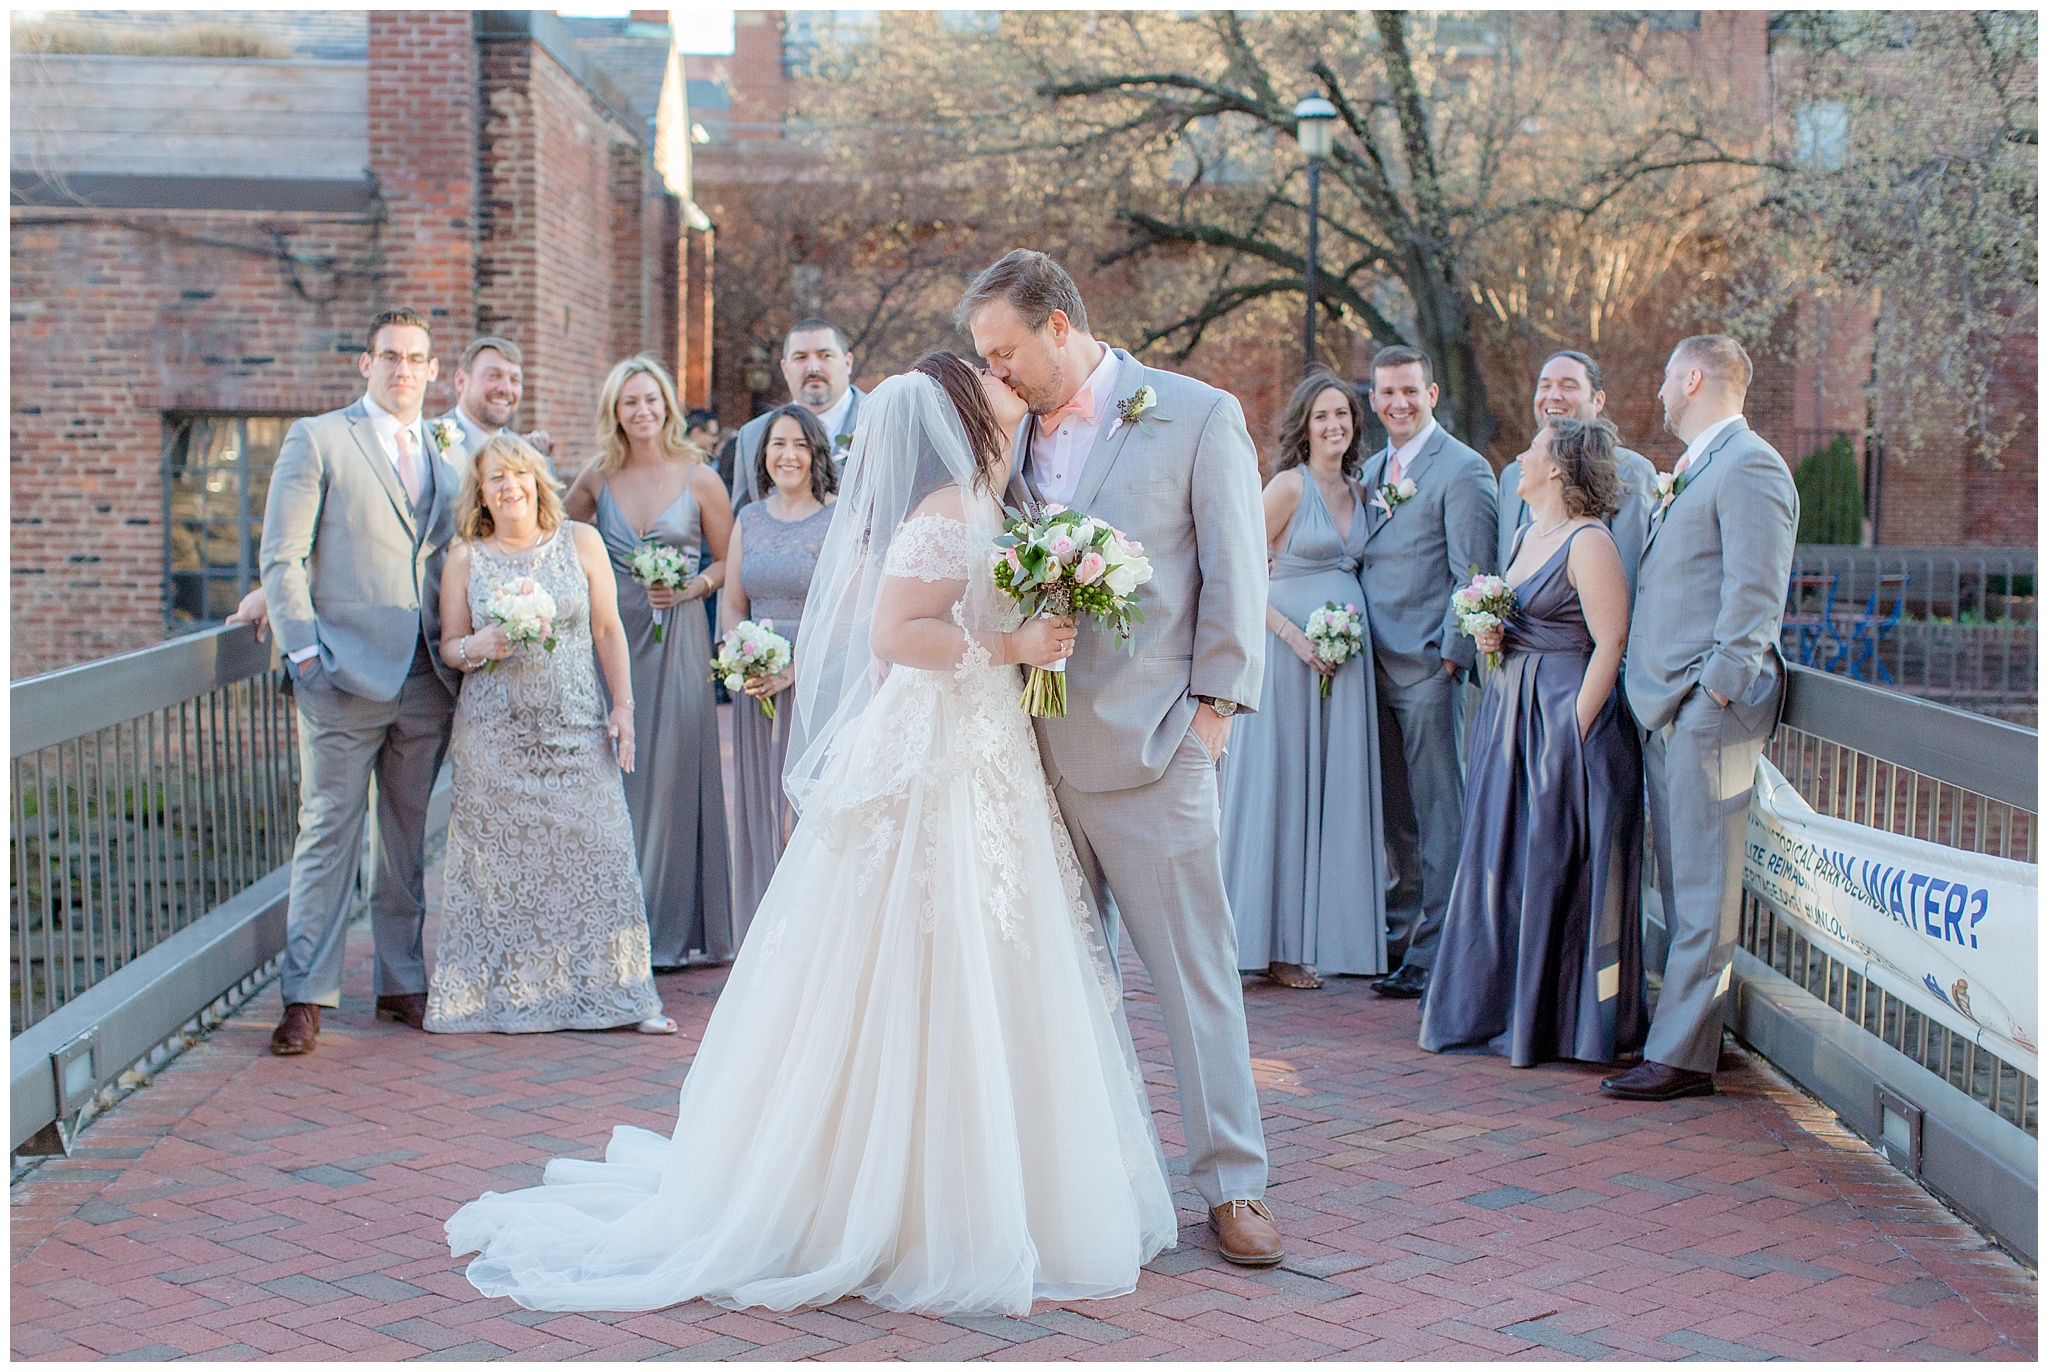 wedding_Miller_0033.jpg